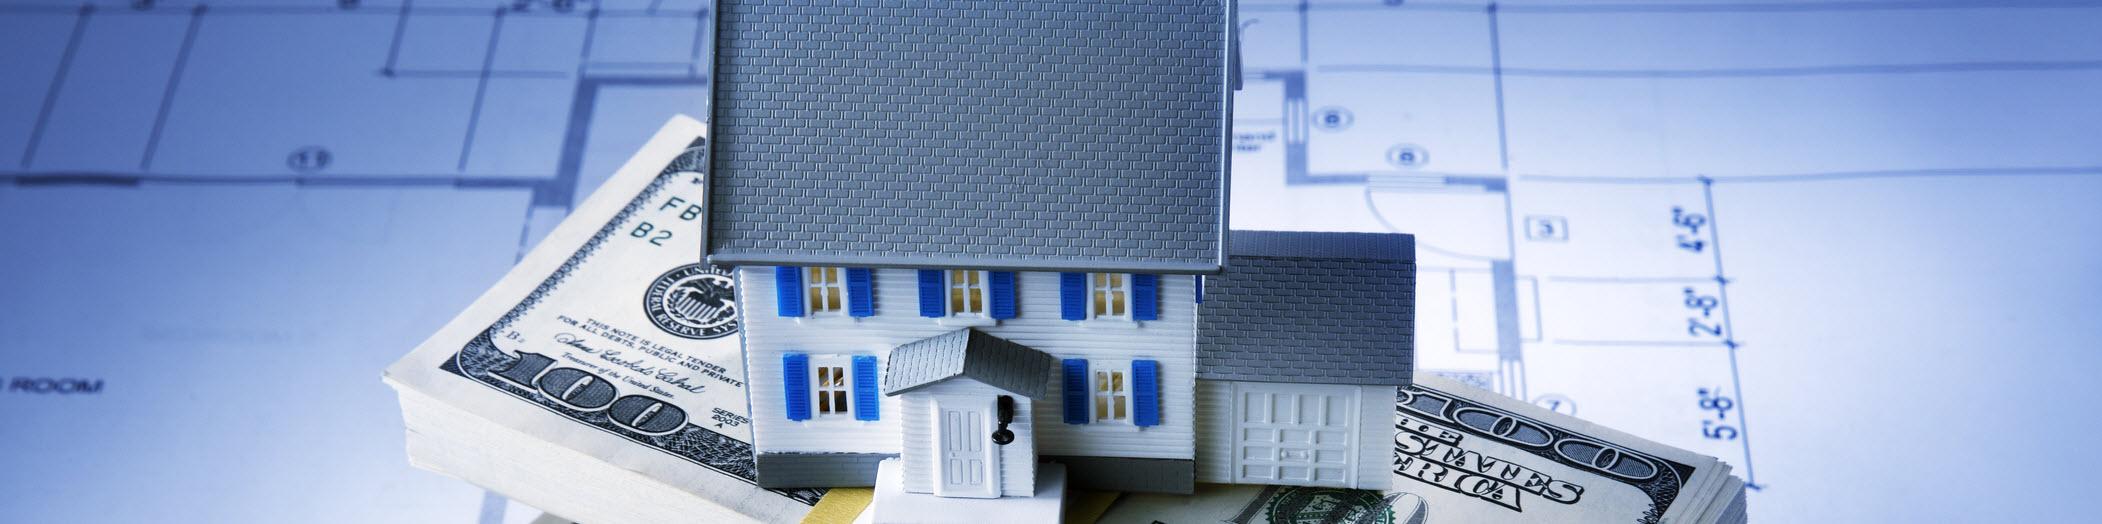 mortgage refinance caculator